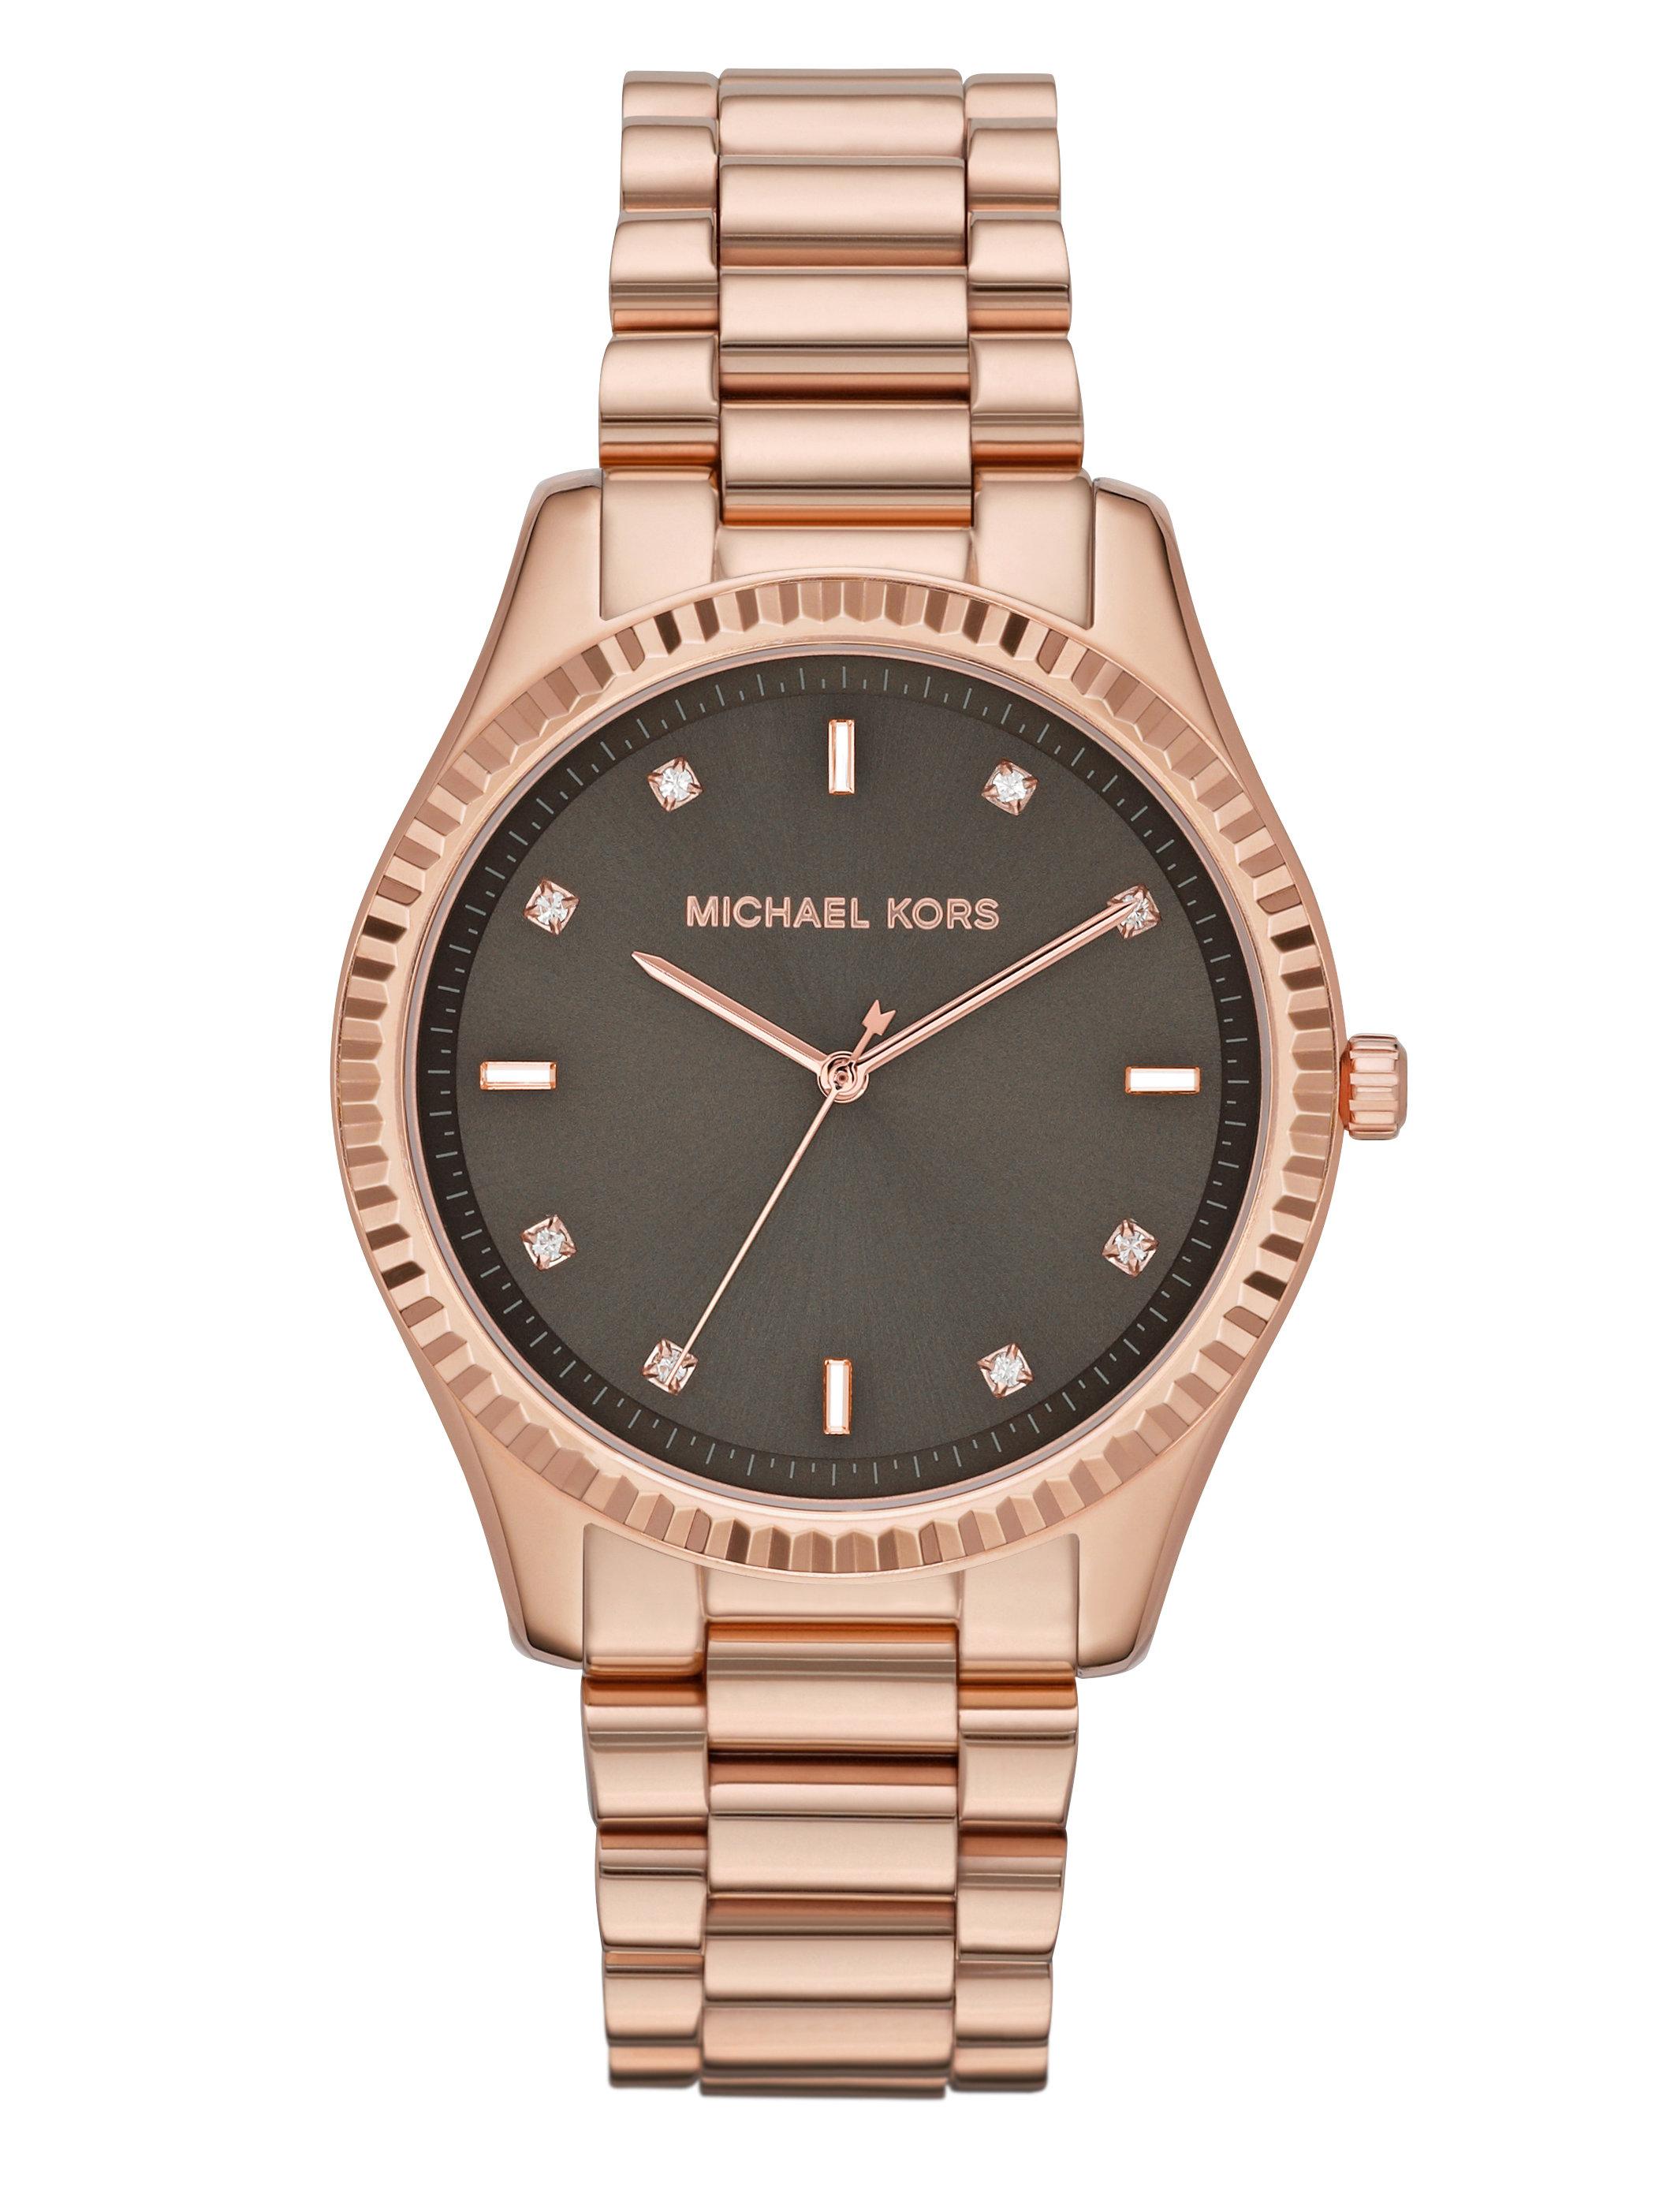 michael kors rose goldtone stainless steel crystal watch. Black Bedroom Furniture Sets. Home Design Ideas